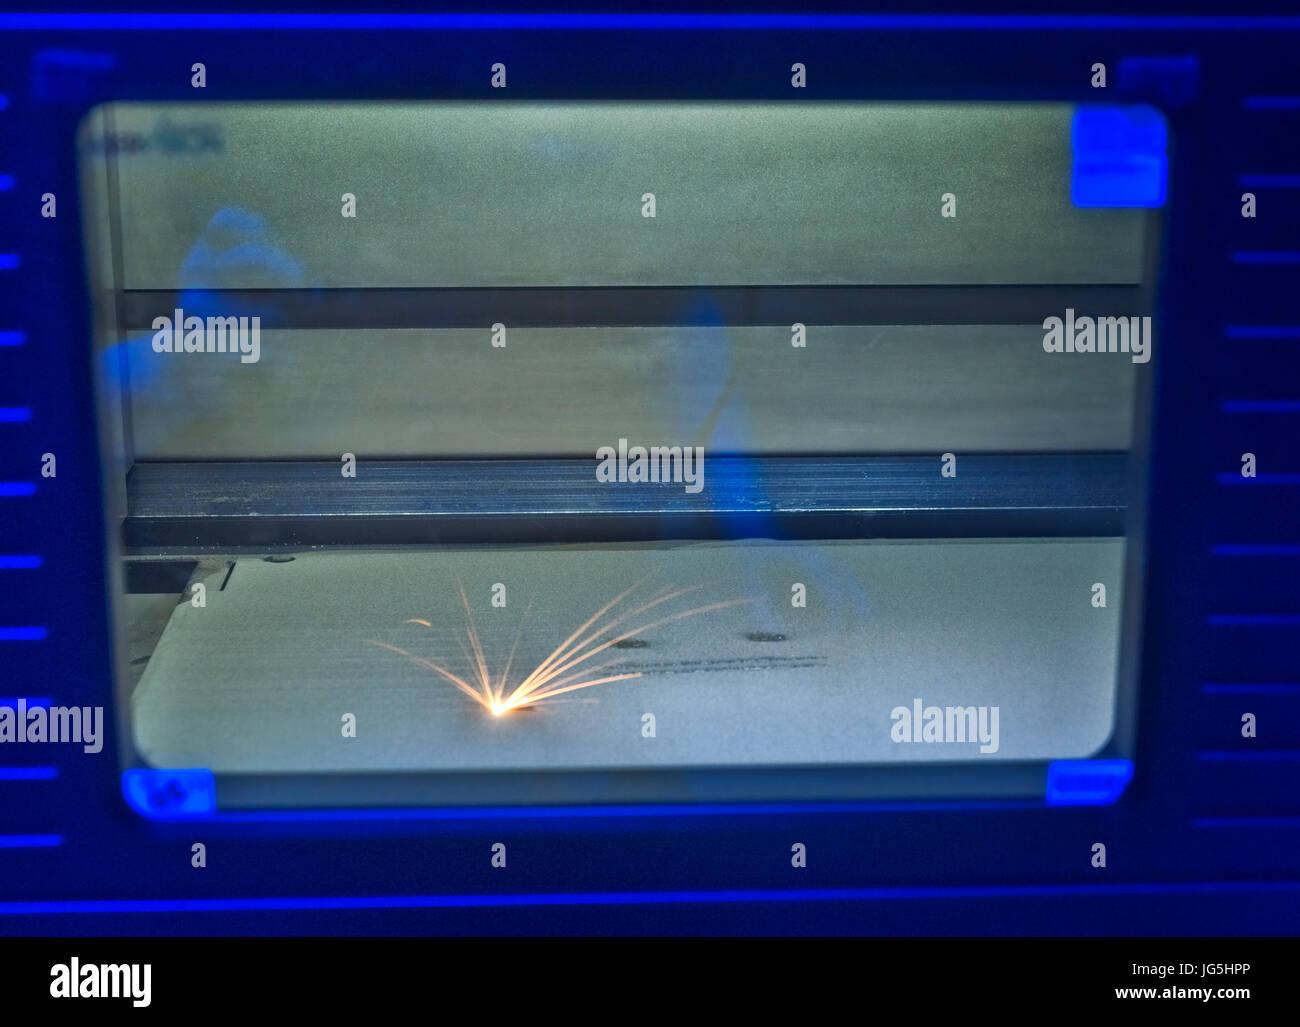 Direct Metal Laser Sintering (DMLS) manufacture of industrial components. - Stock Image